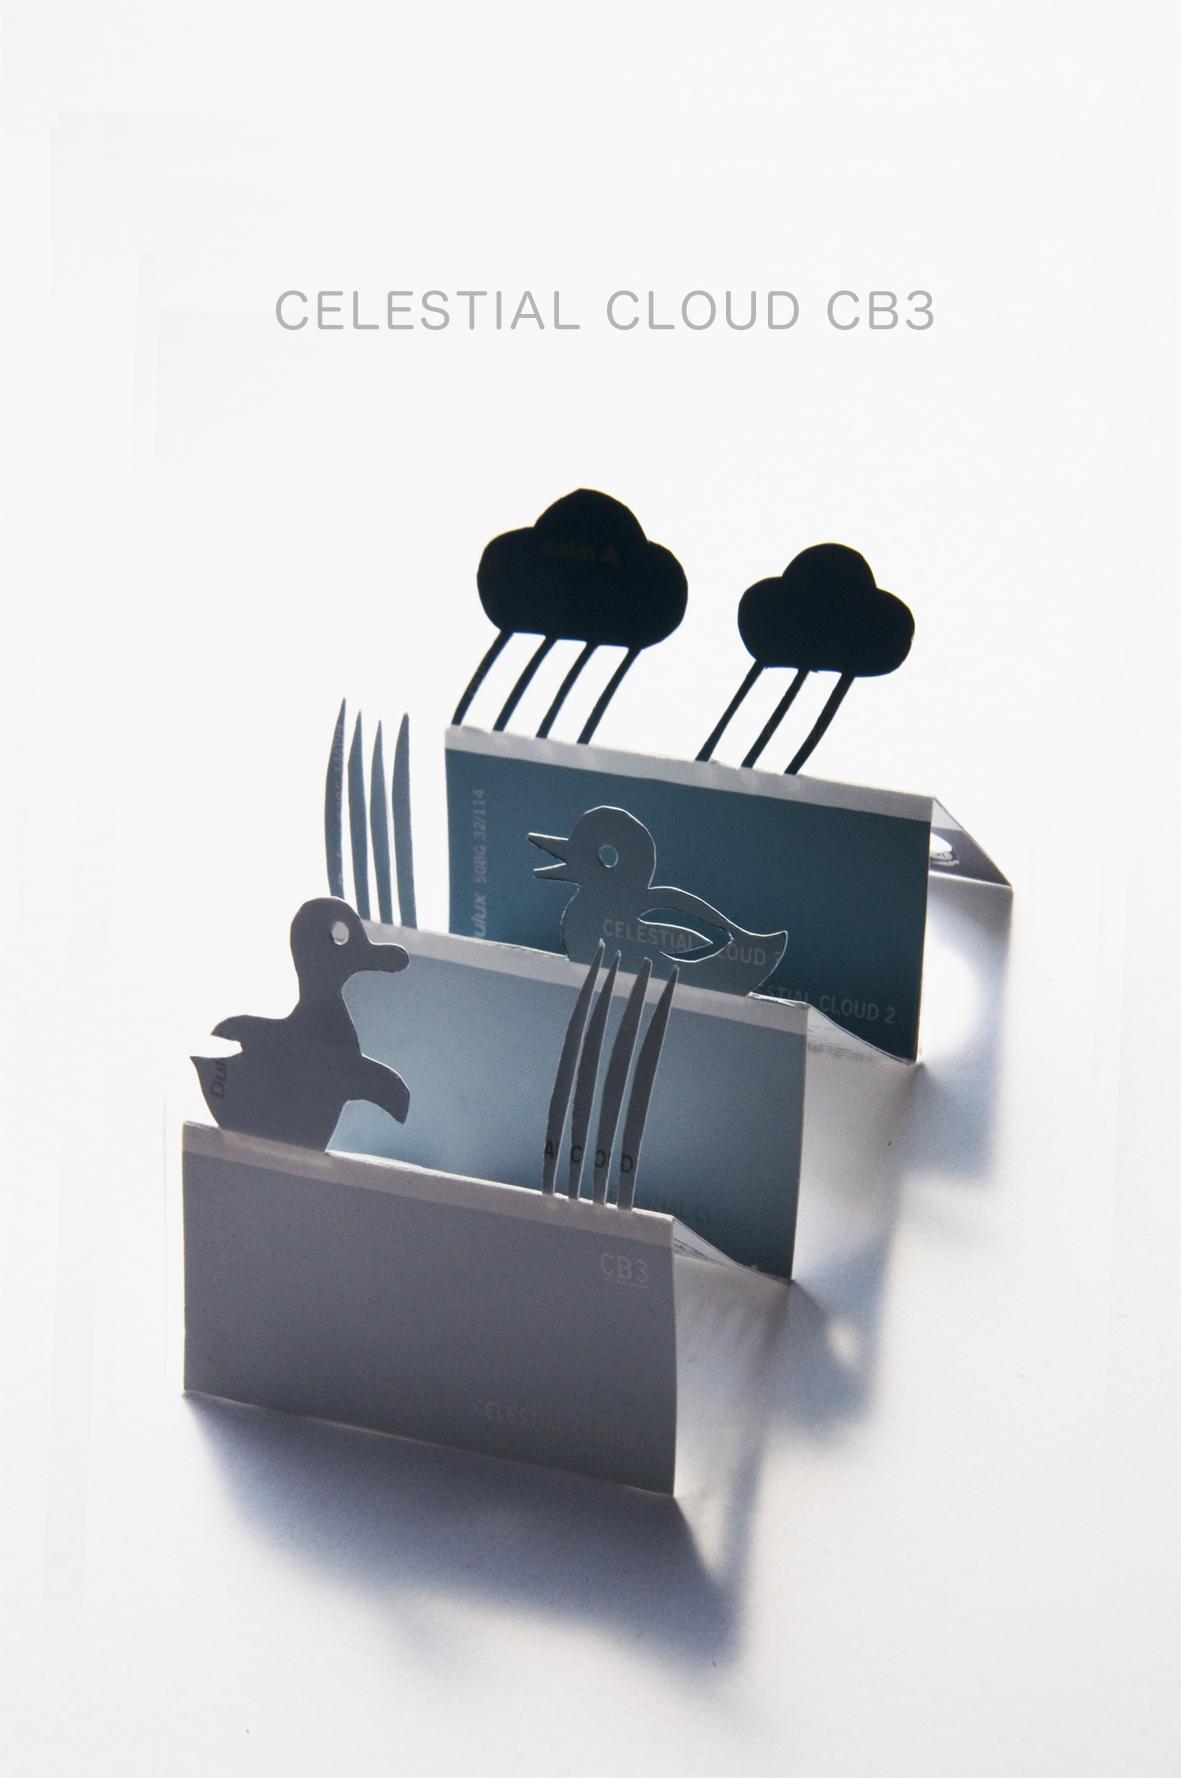 CELESTIAL CLOUD CB3